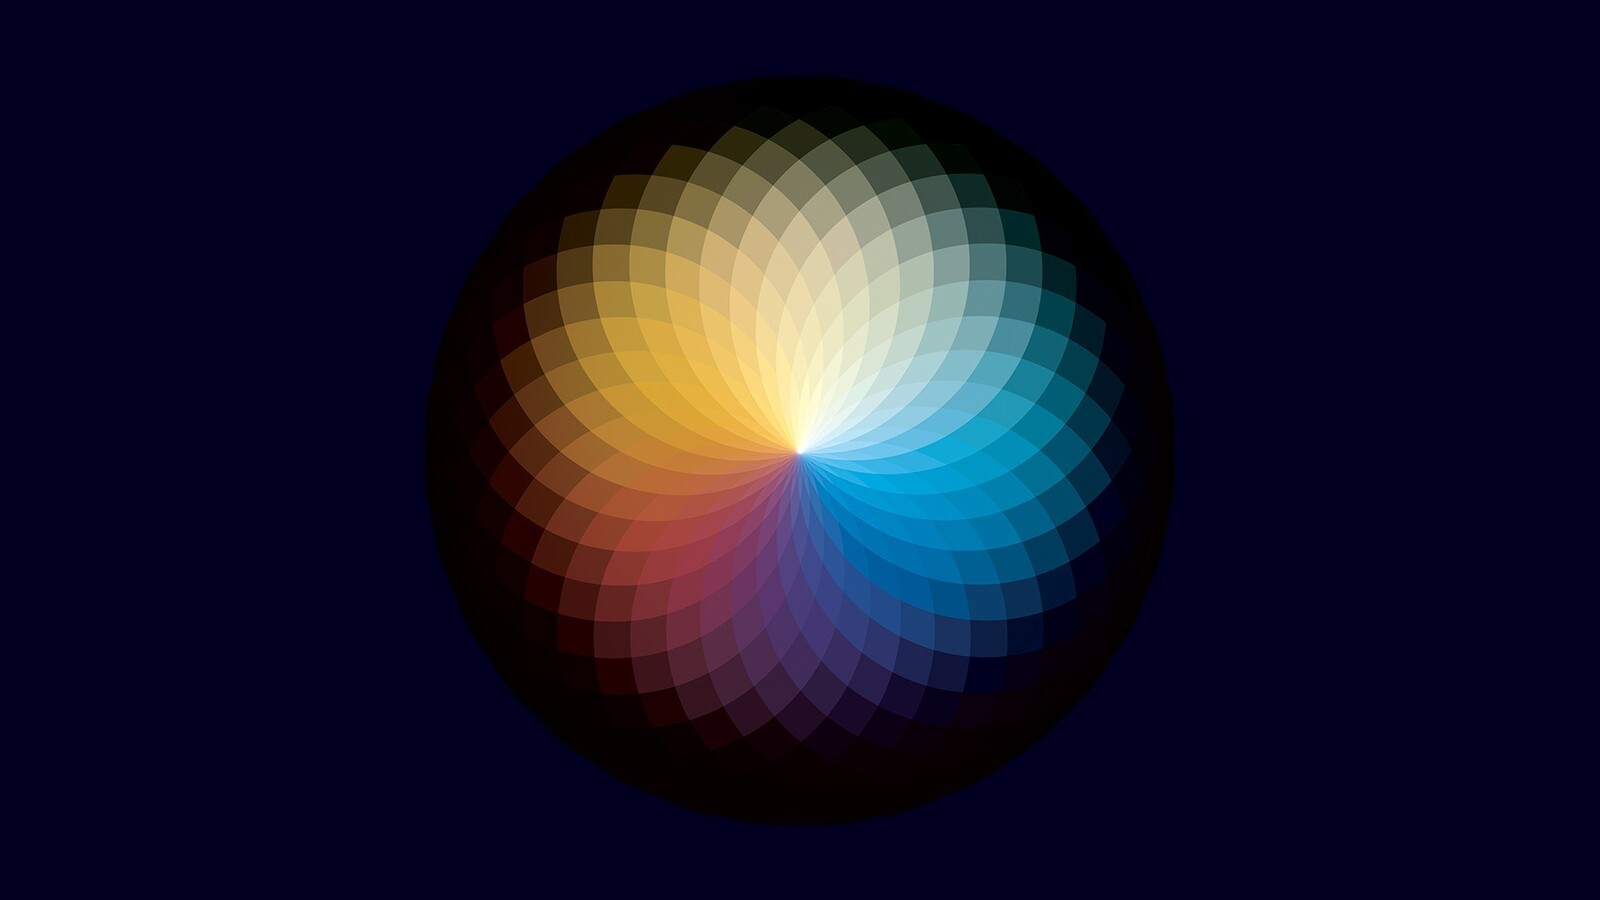 color-wheel-qhd.jpg